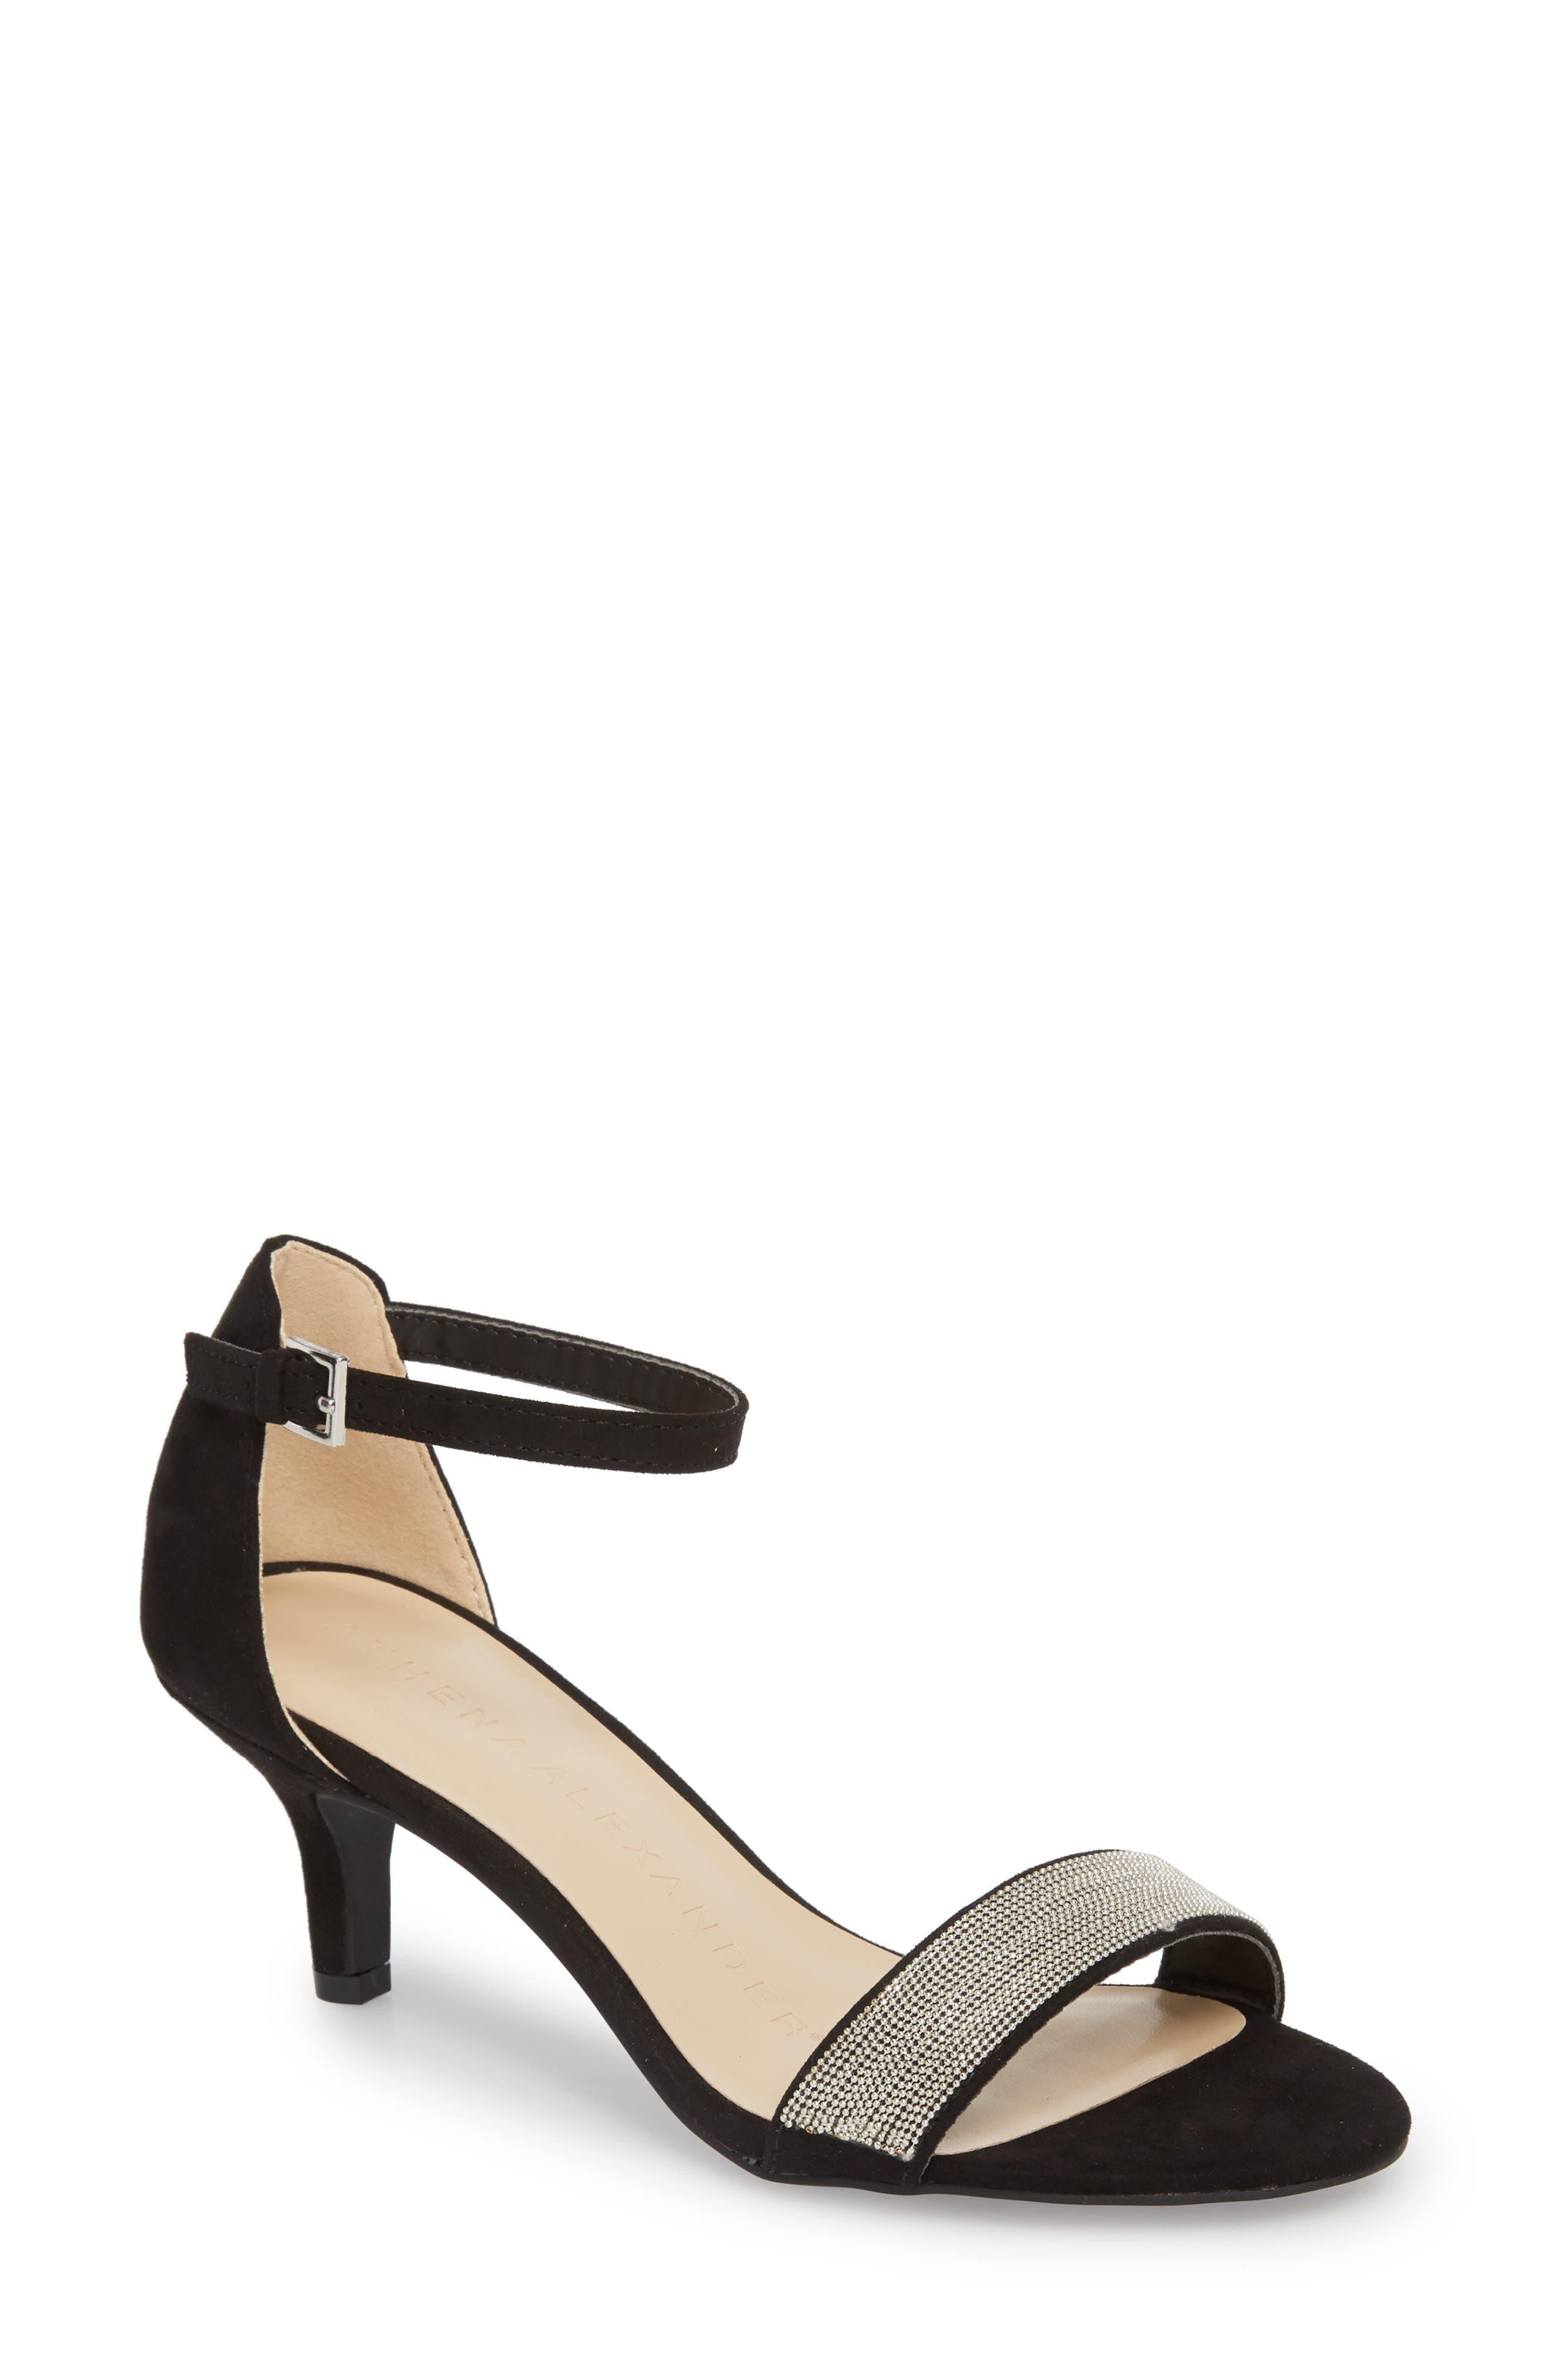 Milford Sandal,                         Main,                         color, BLACK SUEDE